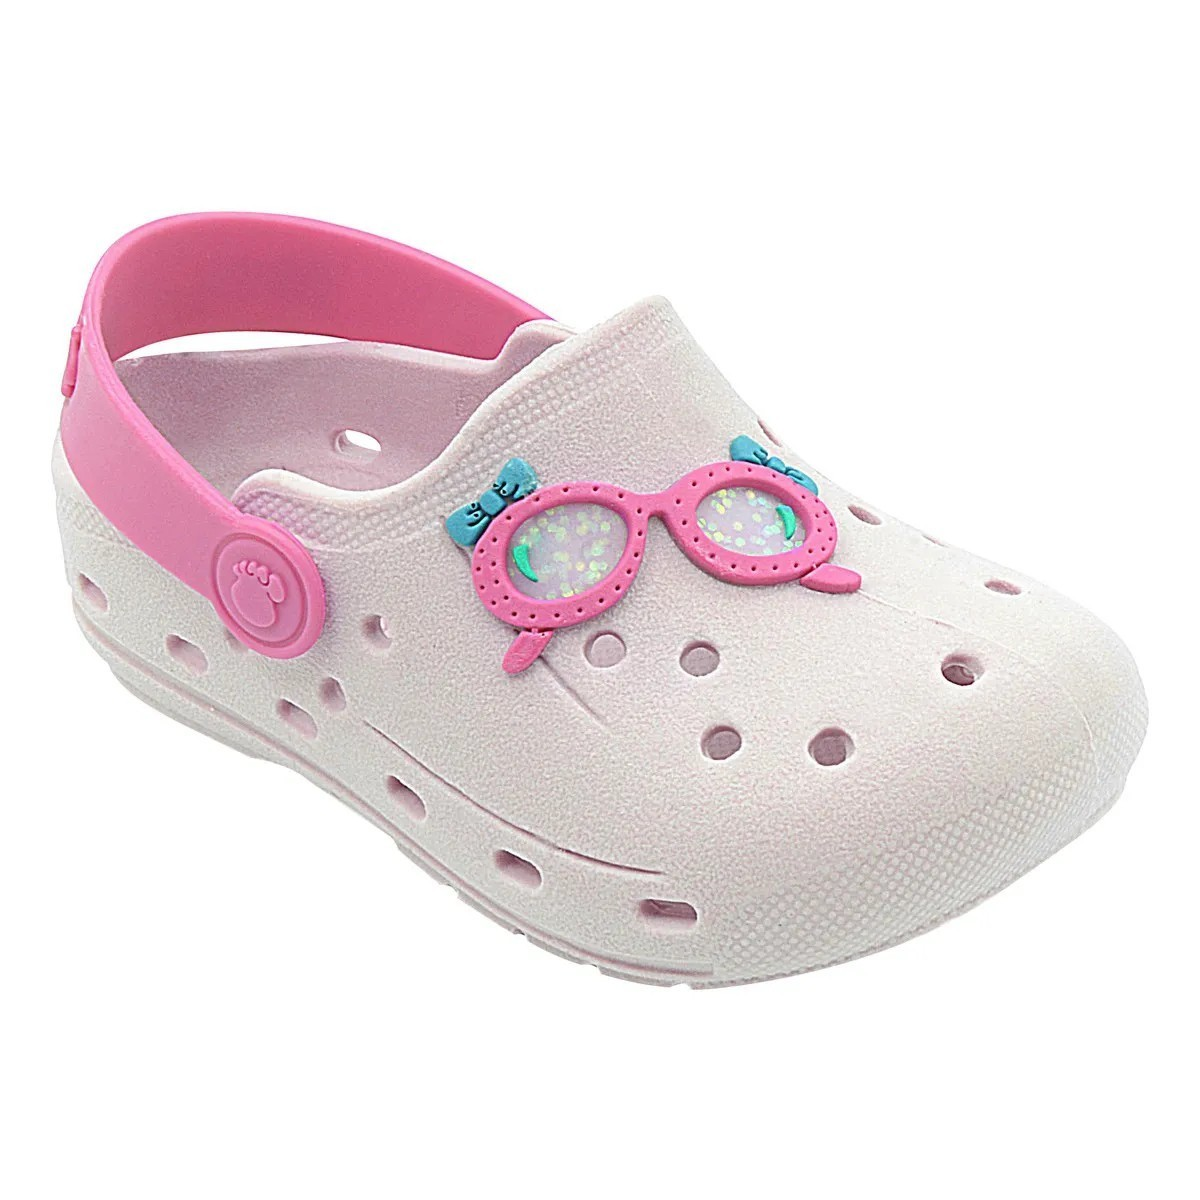 Babuche Infantil Óculos Rosa Menina